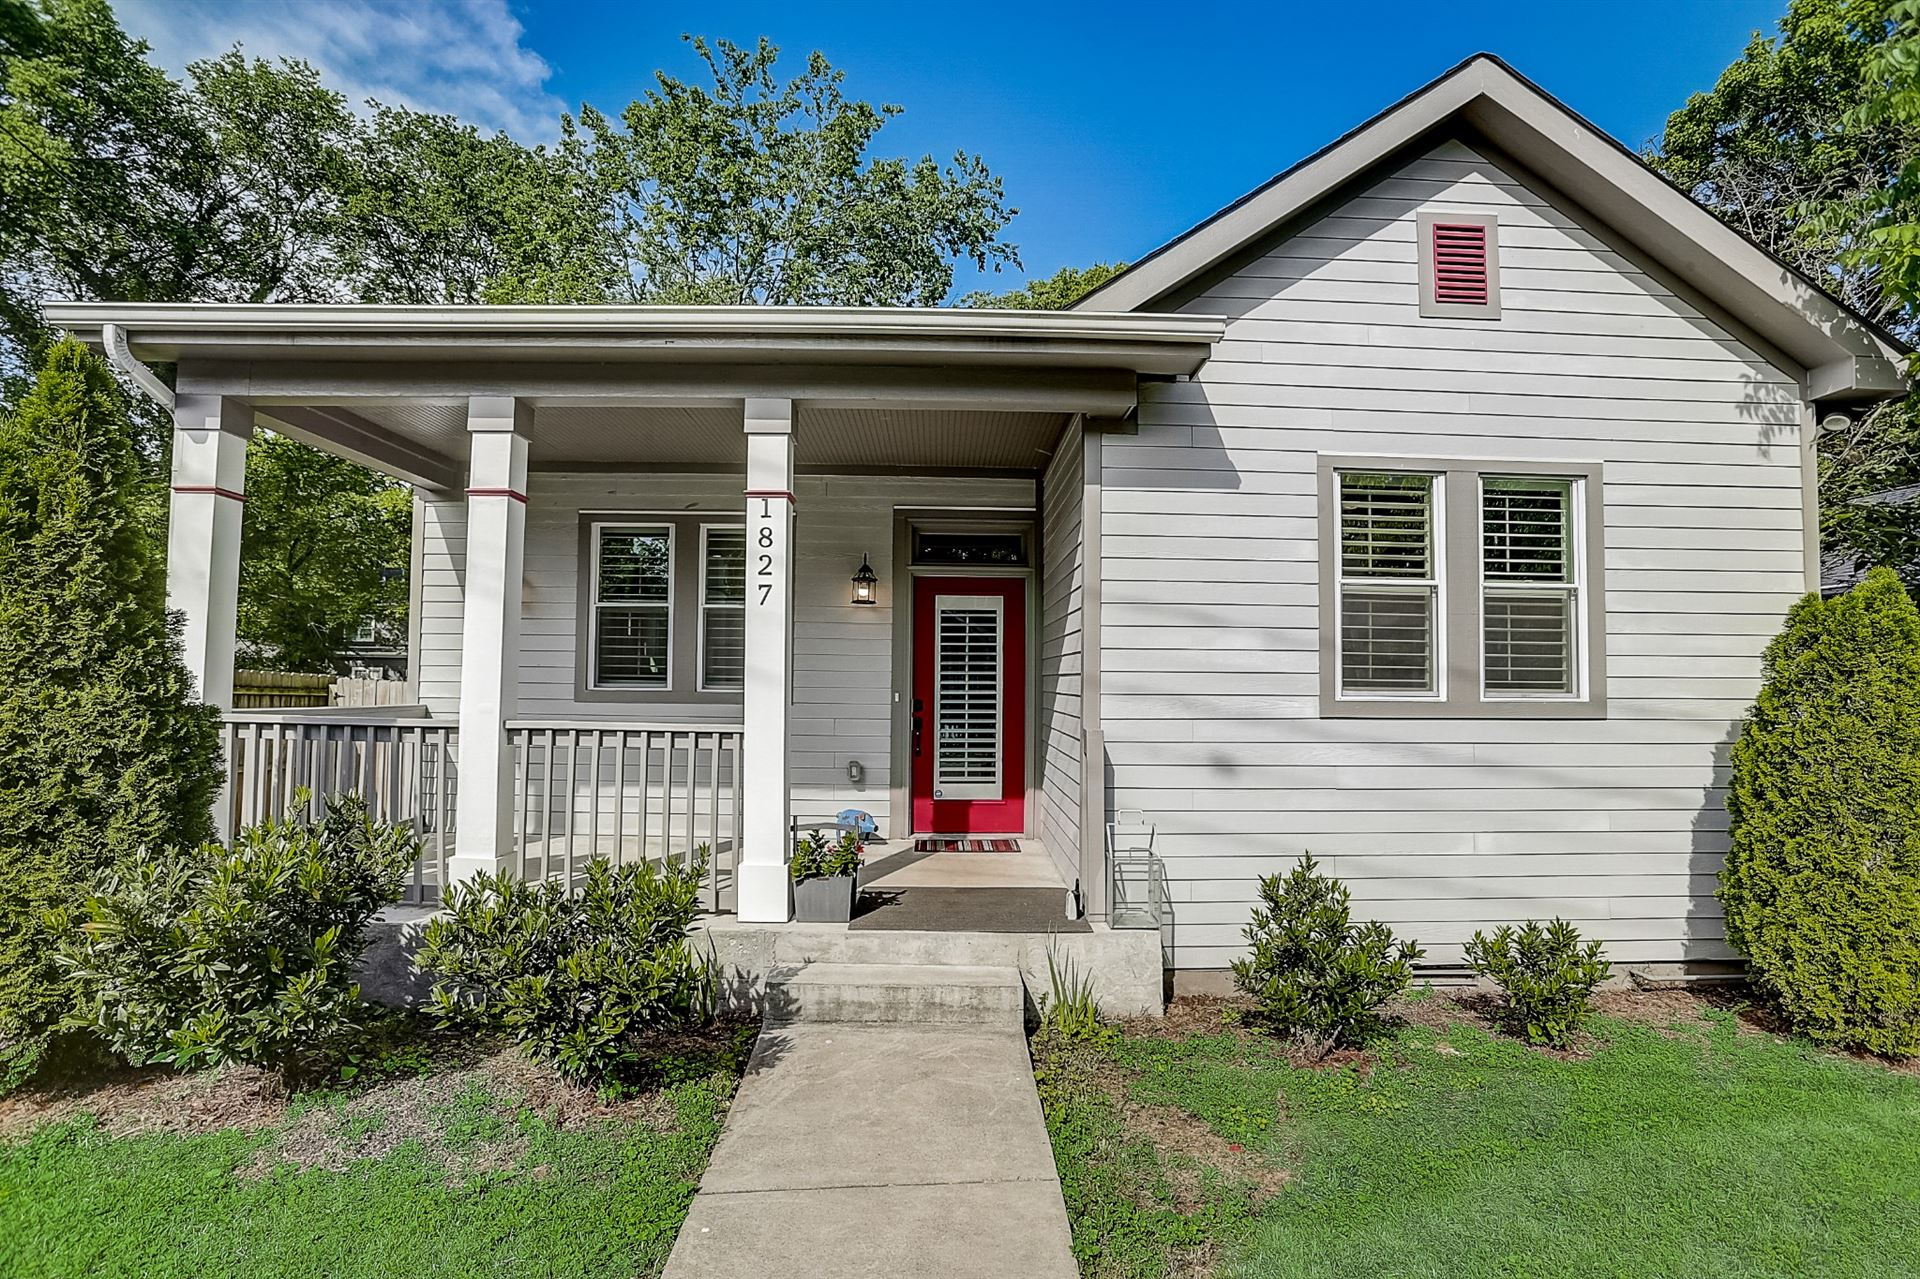 1827 Cephas St, Nashville, TN 37208 - MLS#: 2253455